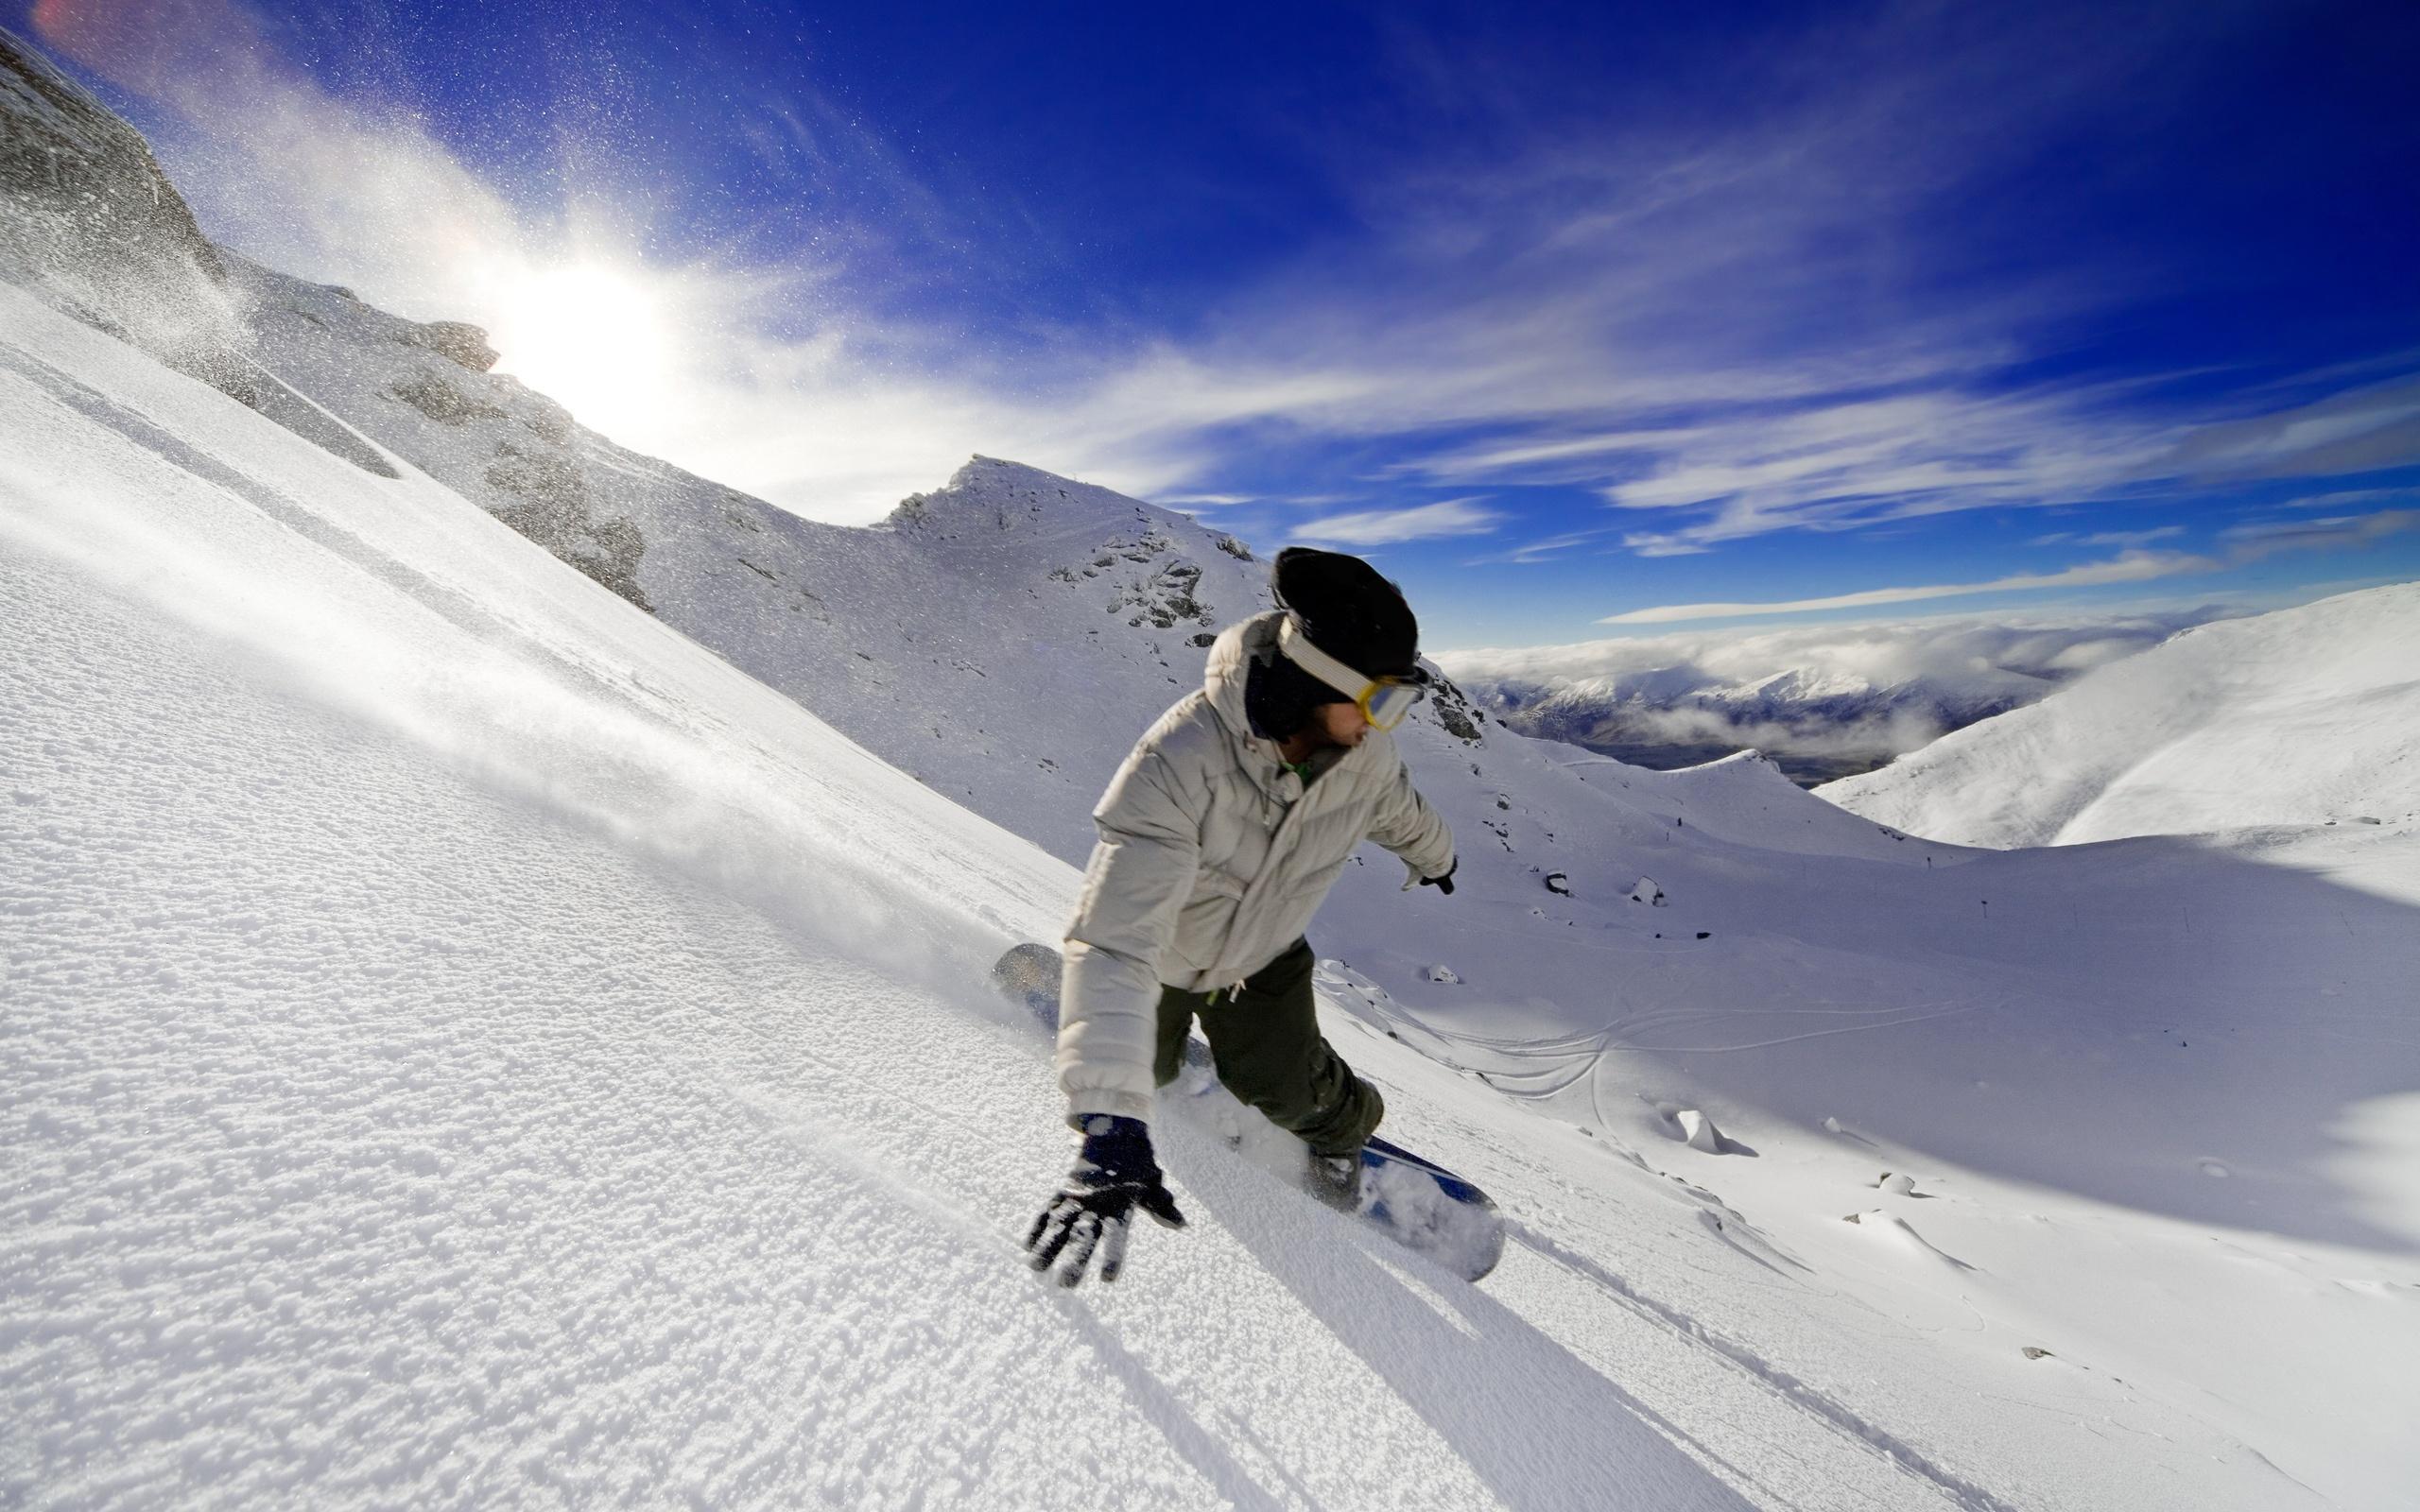 Snowboarding Wallpaper · Snowboarding Wallpaper ...